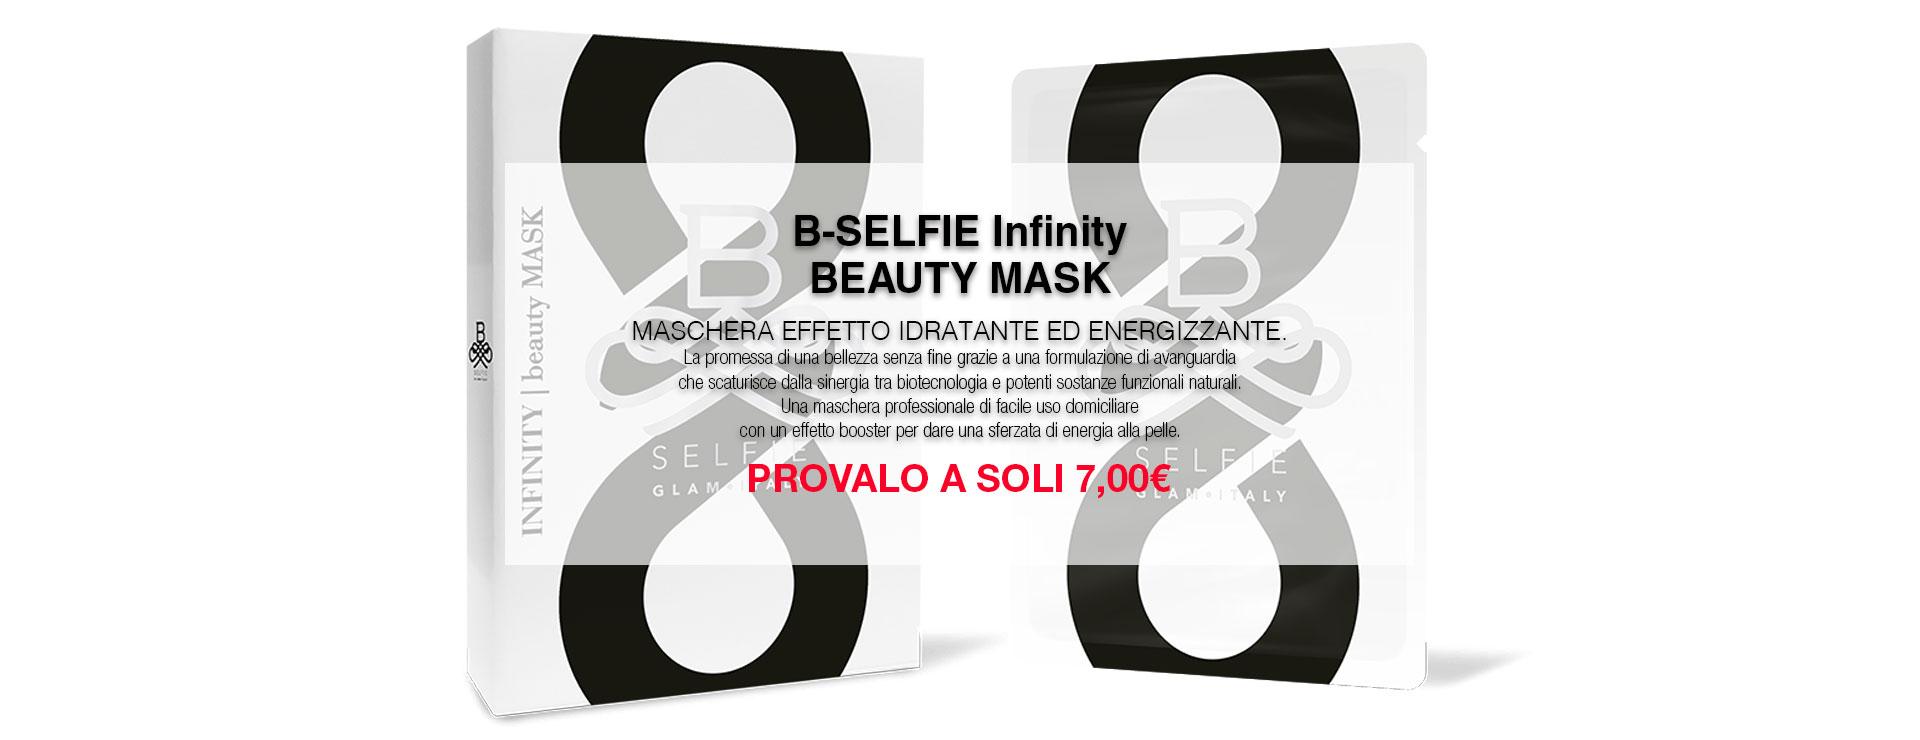 B-selfie Mask Infinity